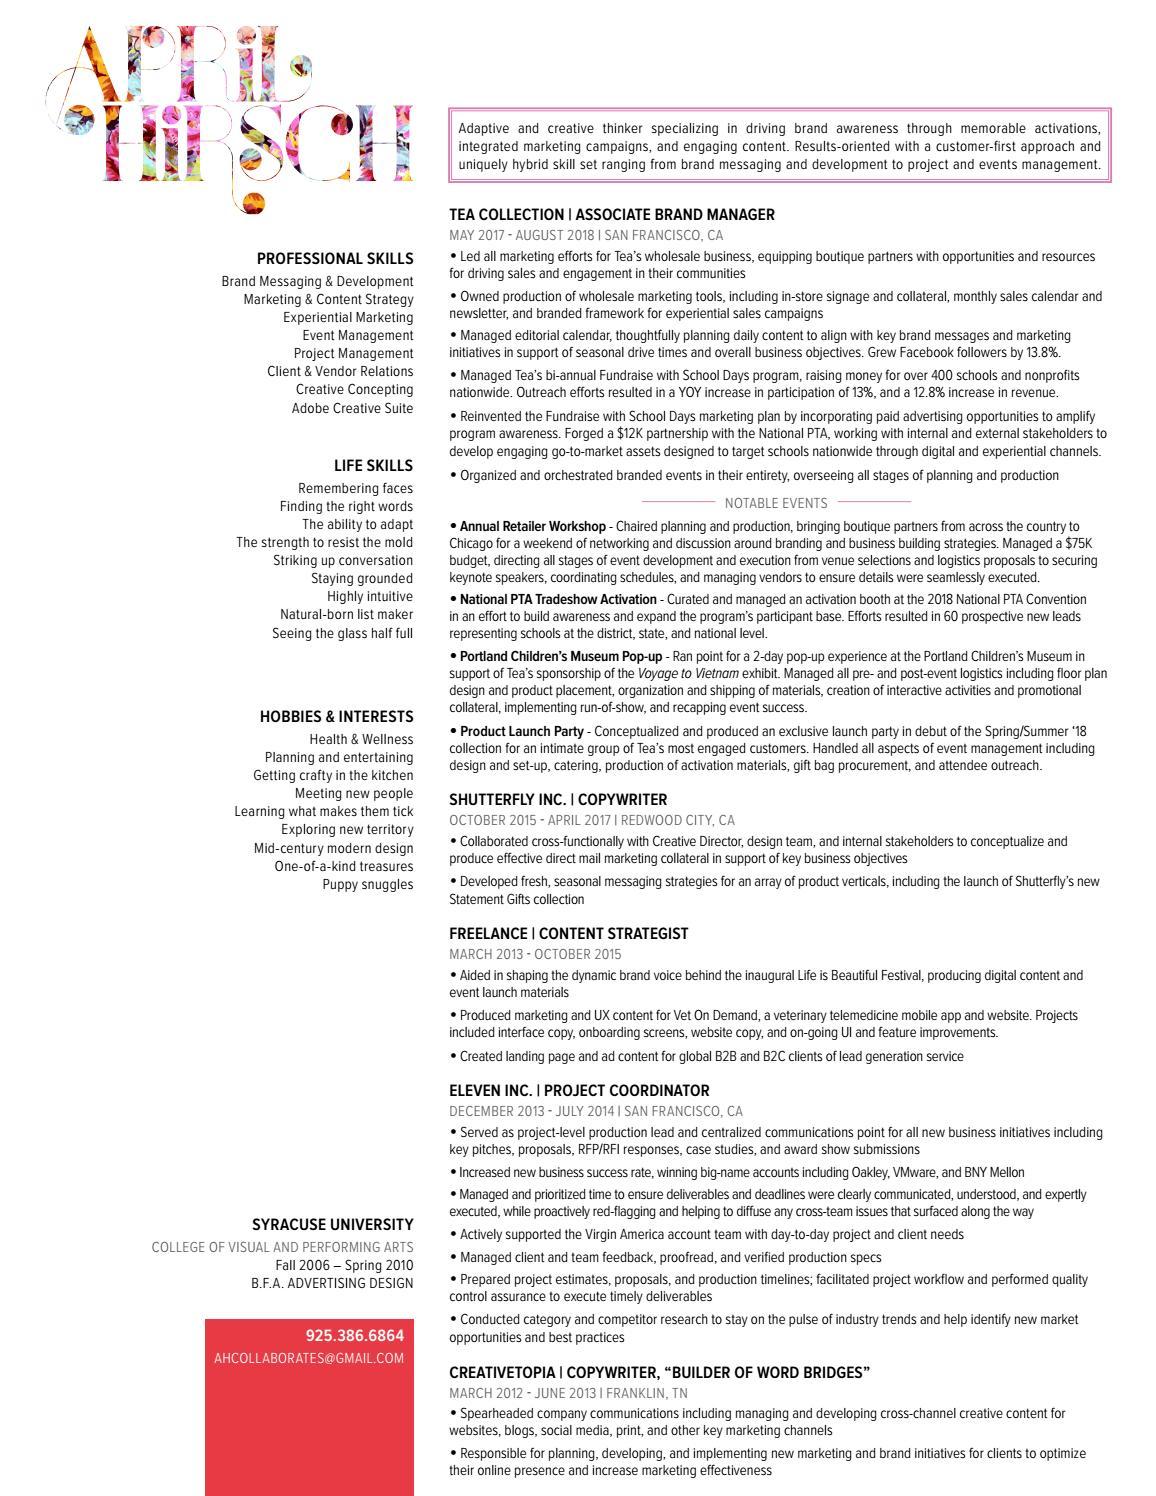 April Hirsch | Resume by April hirsch - issuu